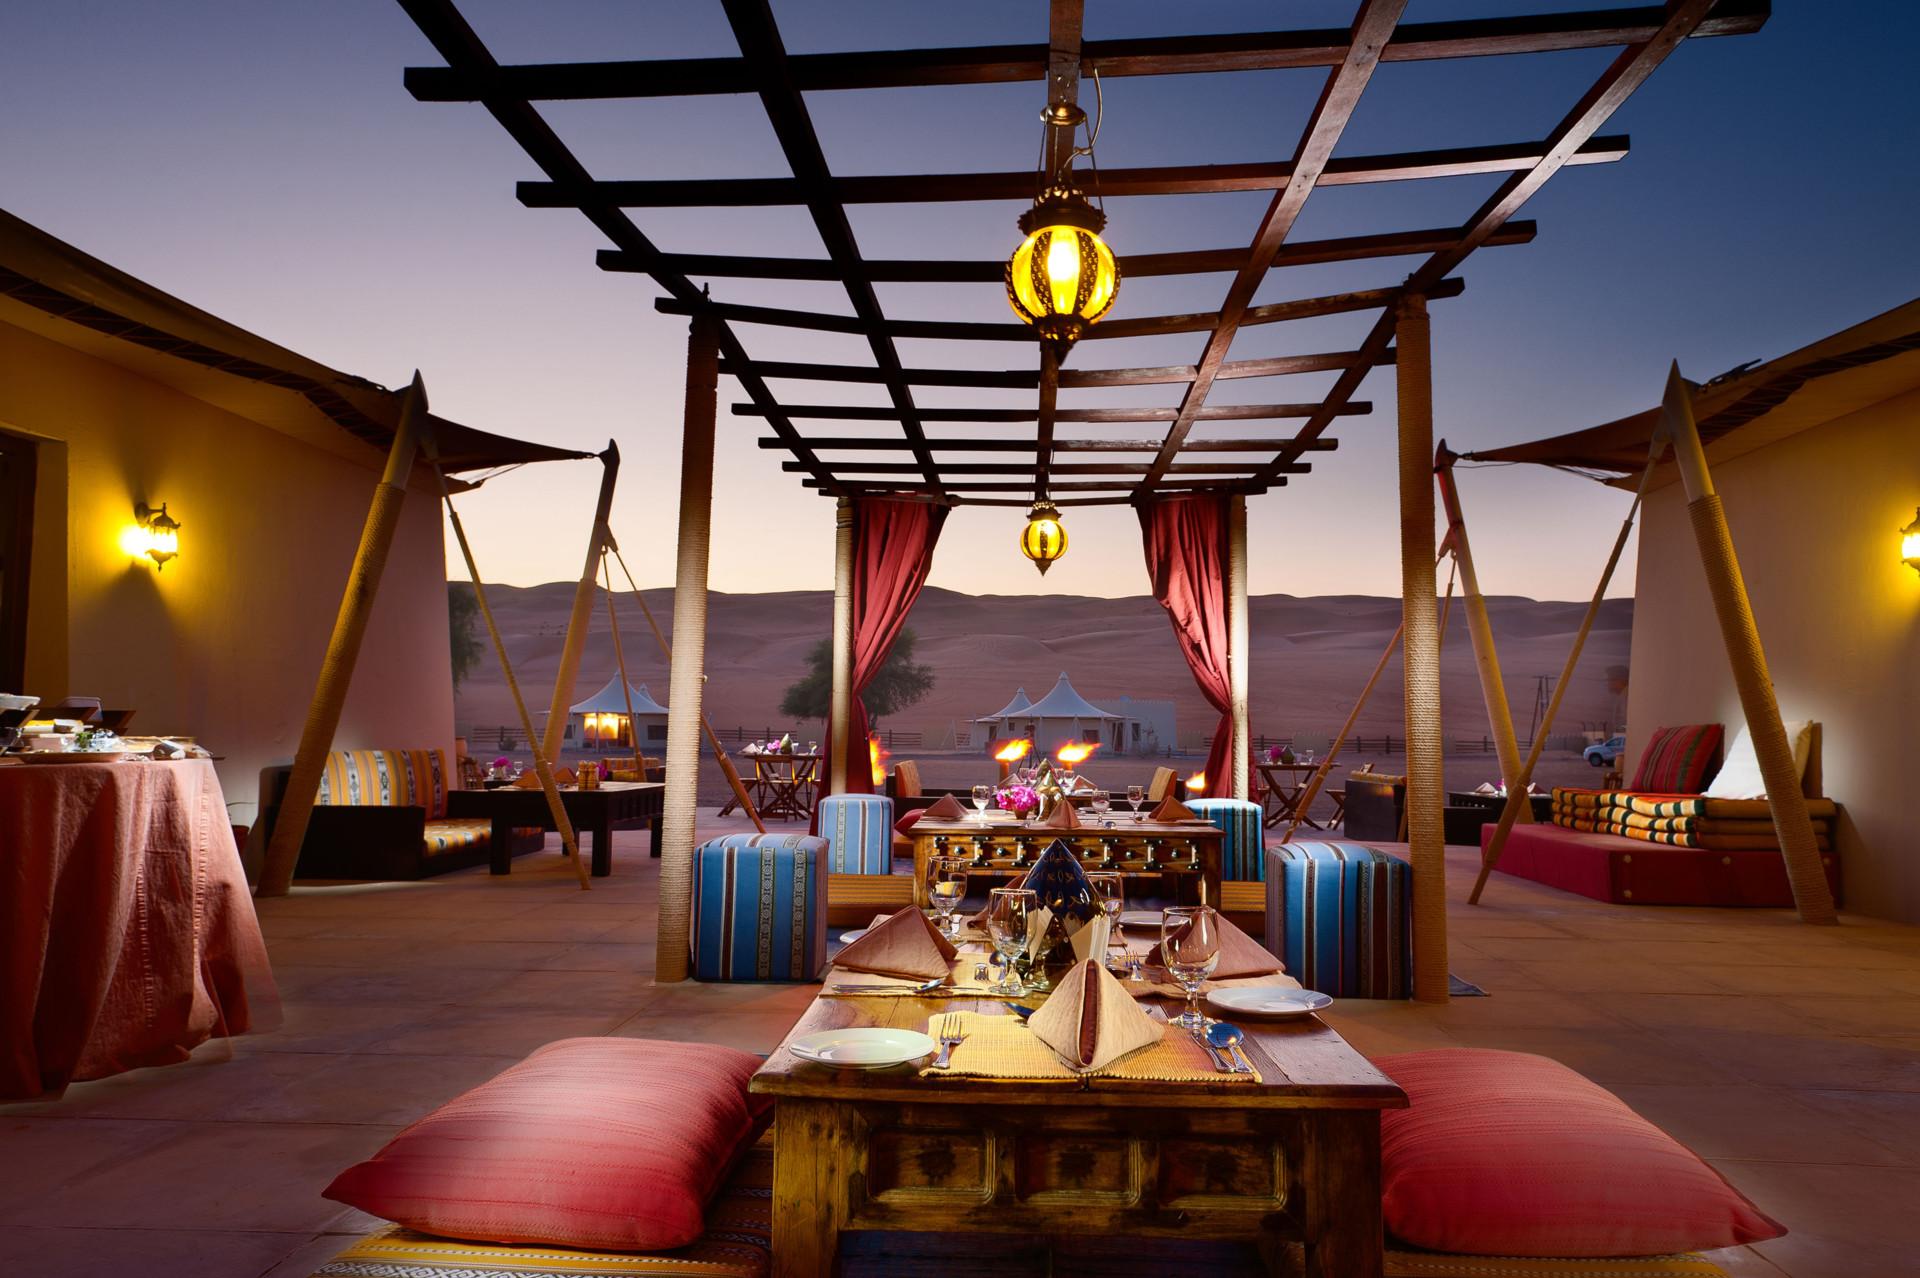 20383-desert-nights-camp-al-wasil-oman-open-air-dinin-crop